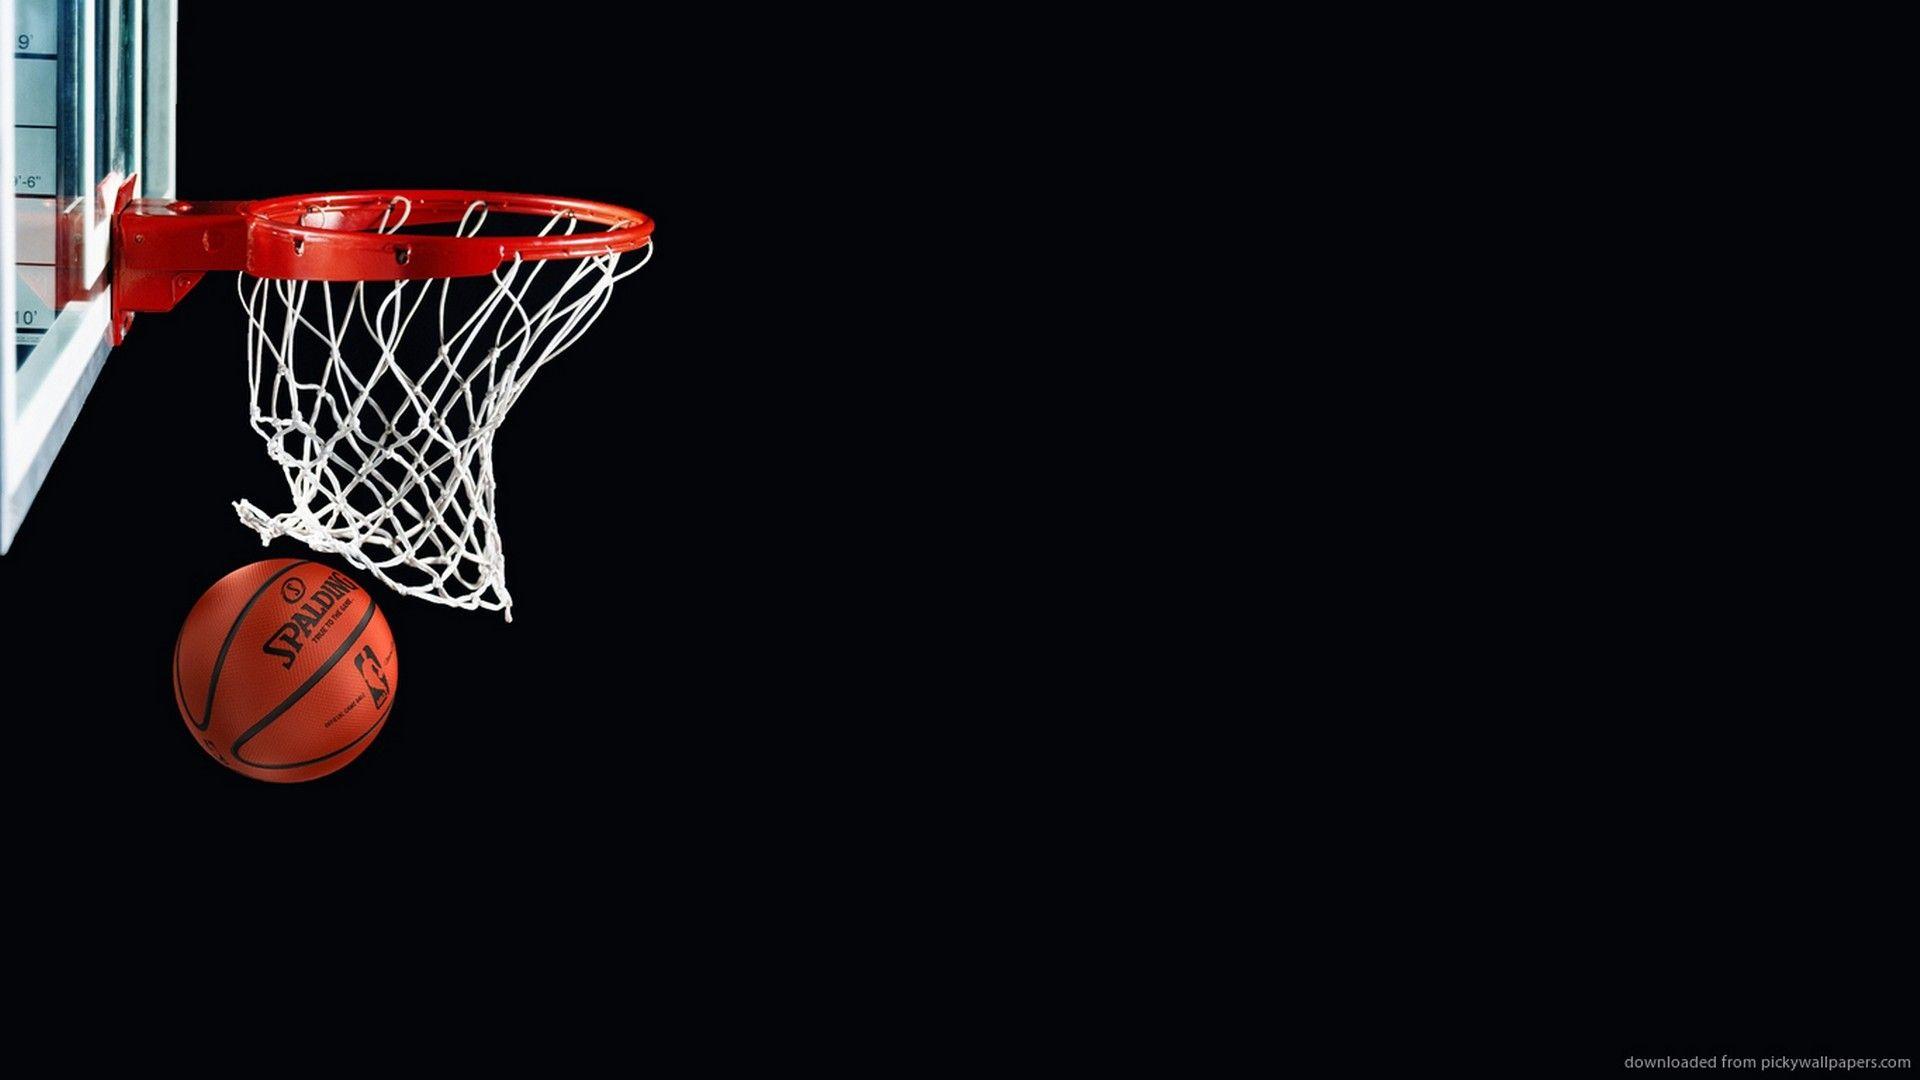 Nba Wallpaper For Mac Backgrounds Basketball Background Basketball Wallpapers Hd Cool Basketball Wallpapers